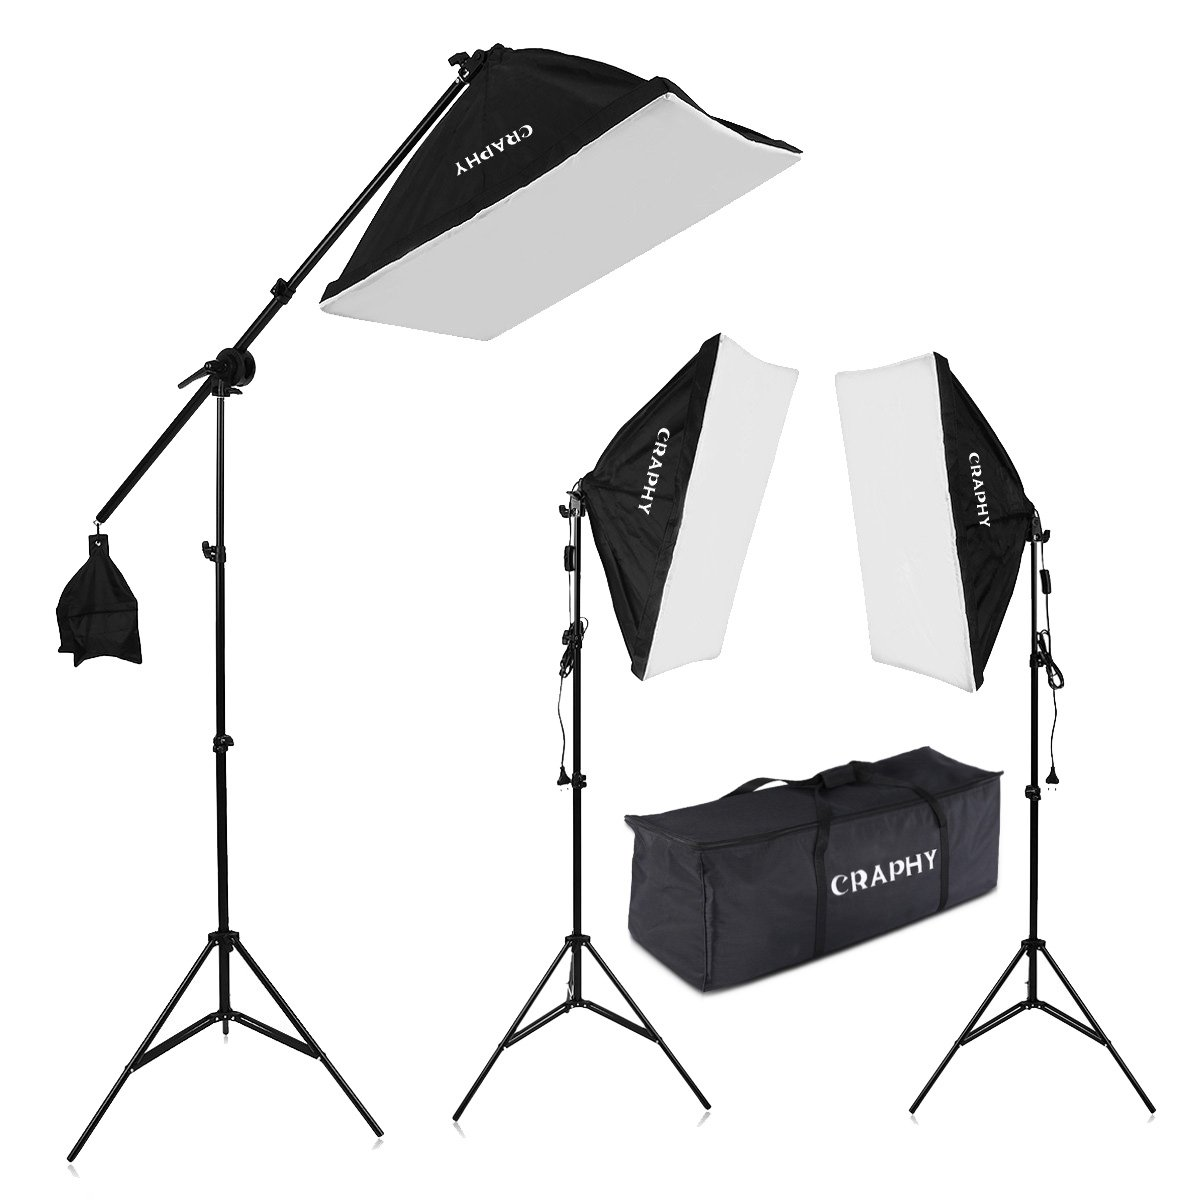 CRAPHY Upgraded 20x28 Photography Lighting Kit Auto Pop-Up Softbox Light Kits 700W 5500K Photography Softbox Light Set Softboxes Continuous Lighting for Photo Studio Portrait Video Shooting/…